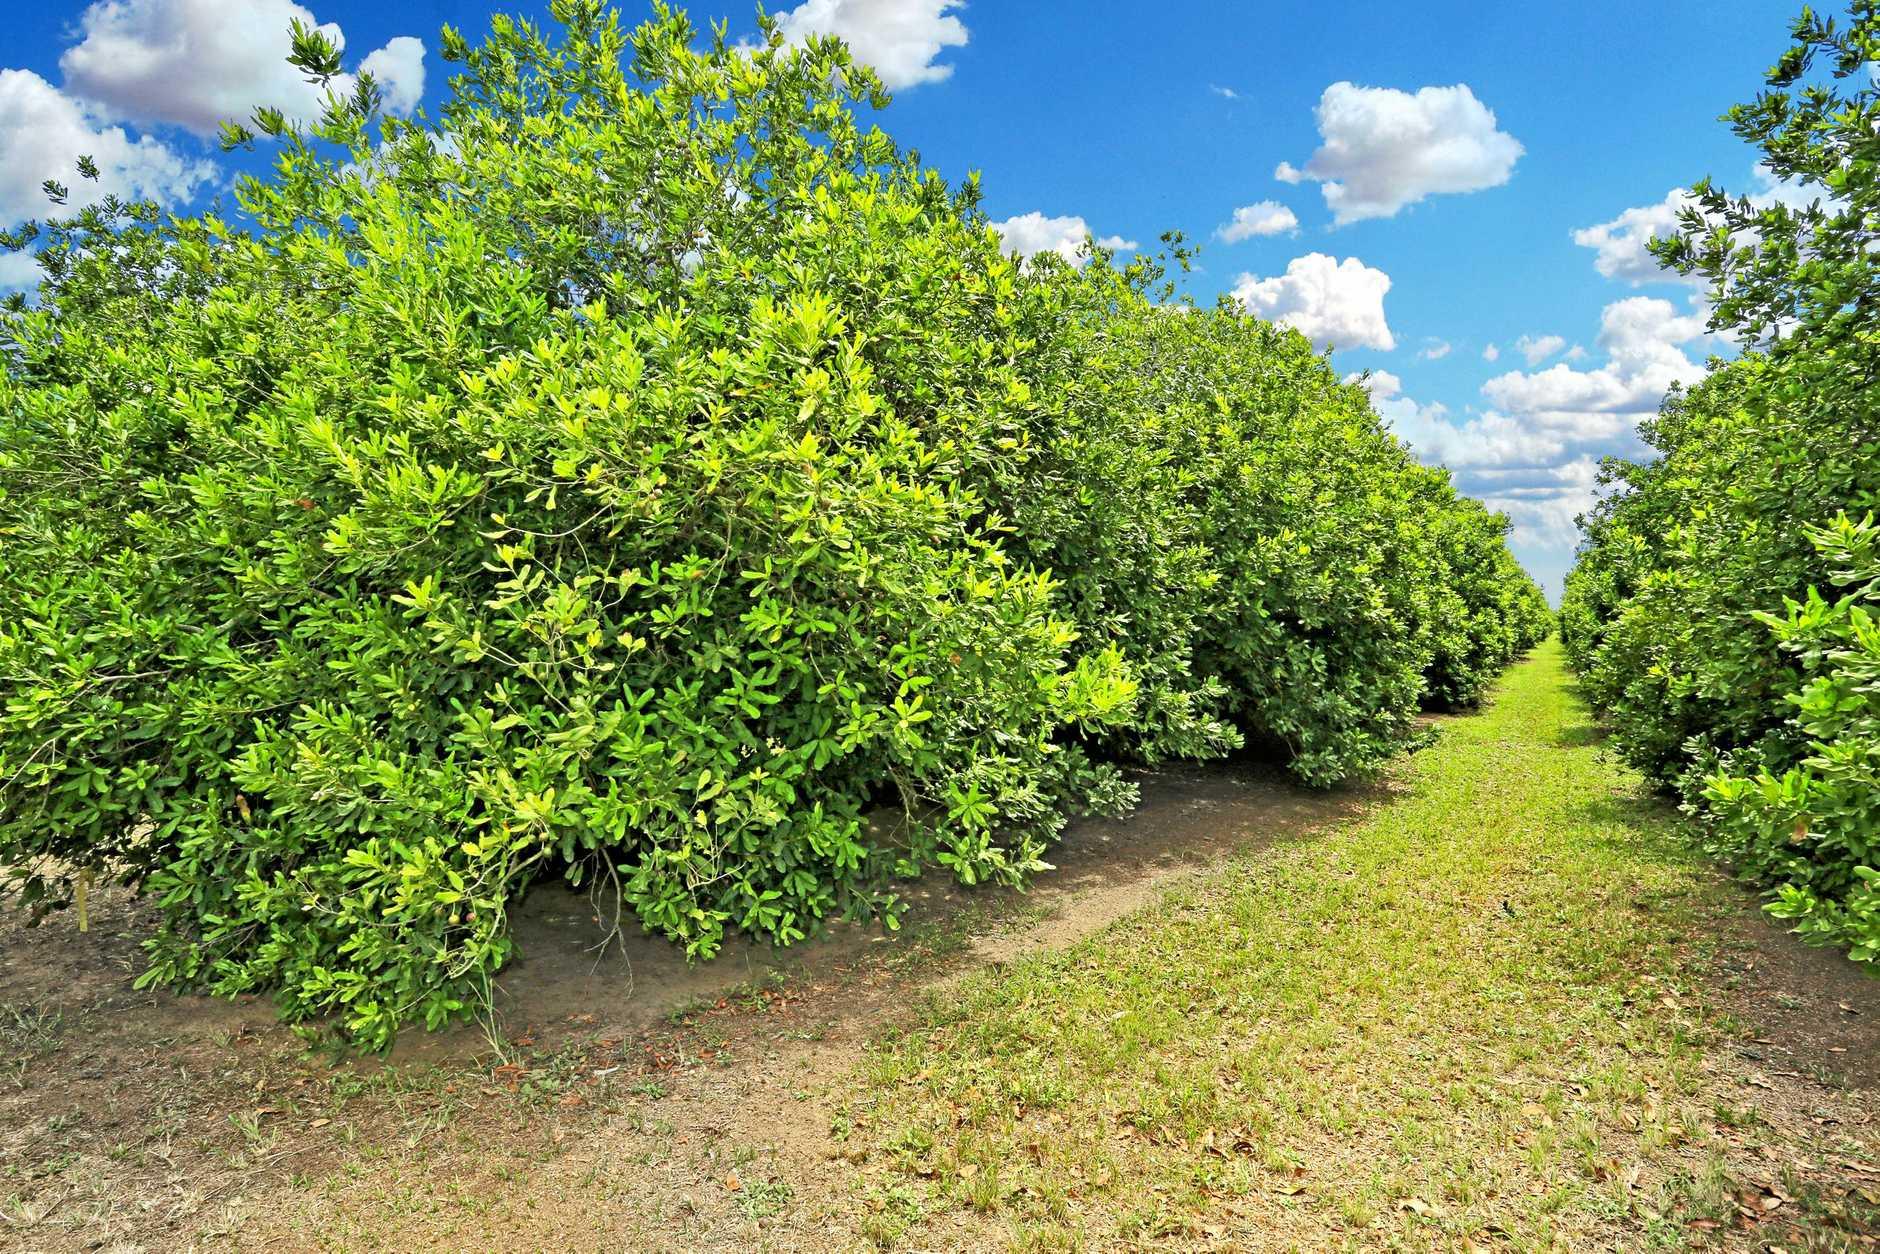 Macadamia Plantation up for sale in Bundaberg.